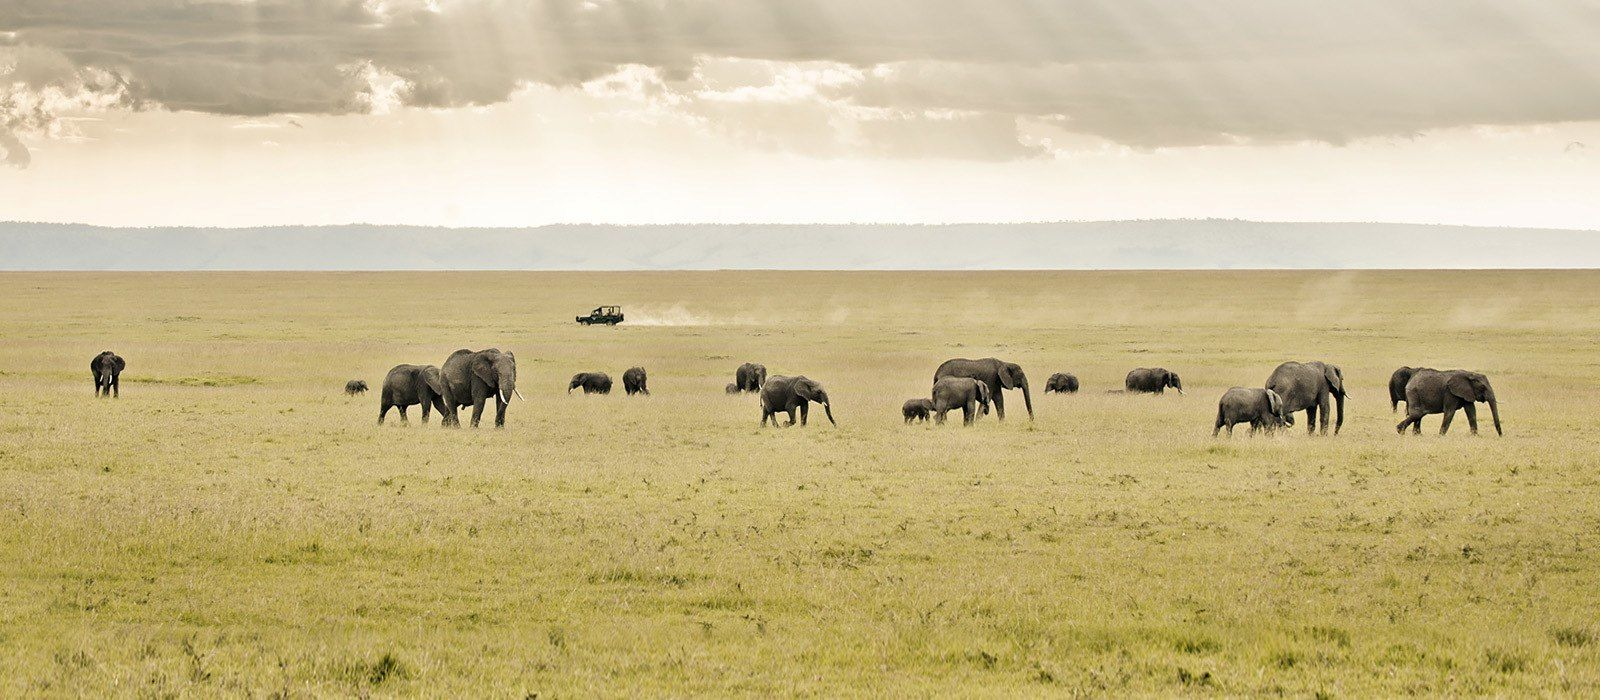 Kenia: Masai Mara, Wandersafaris & Traumstrände Urlaub 4